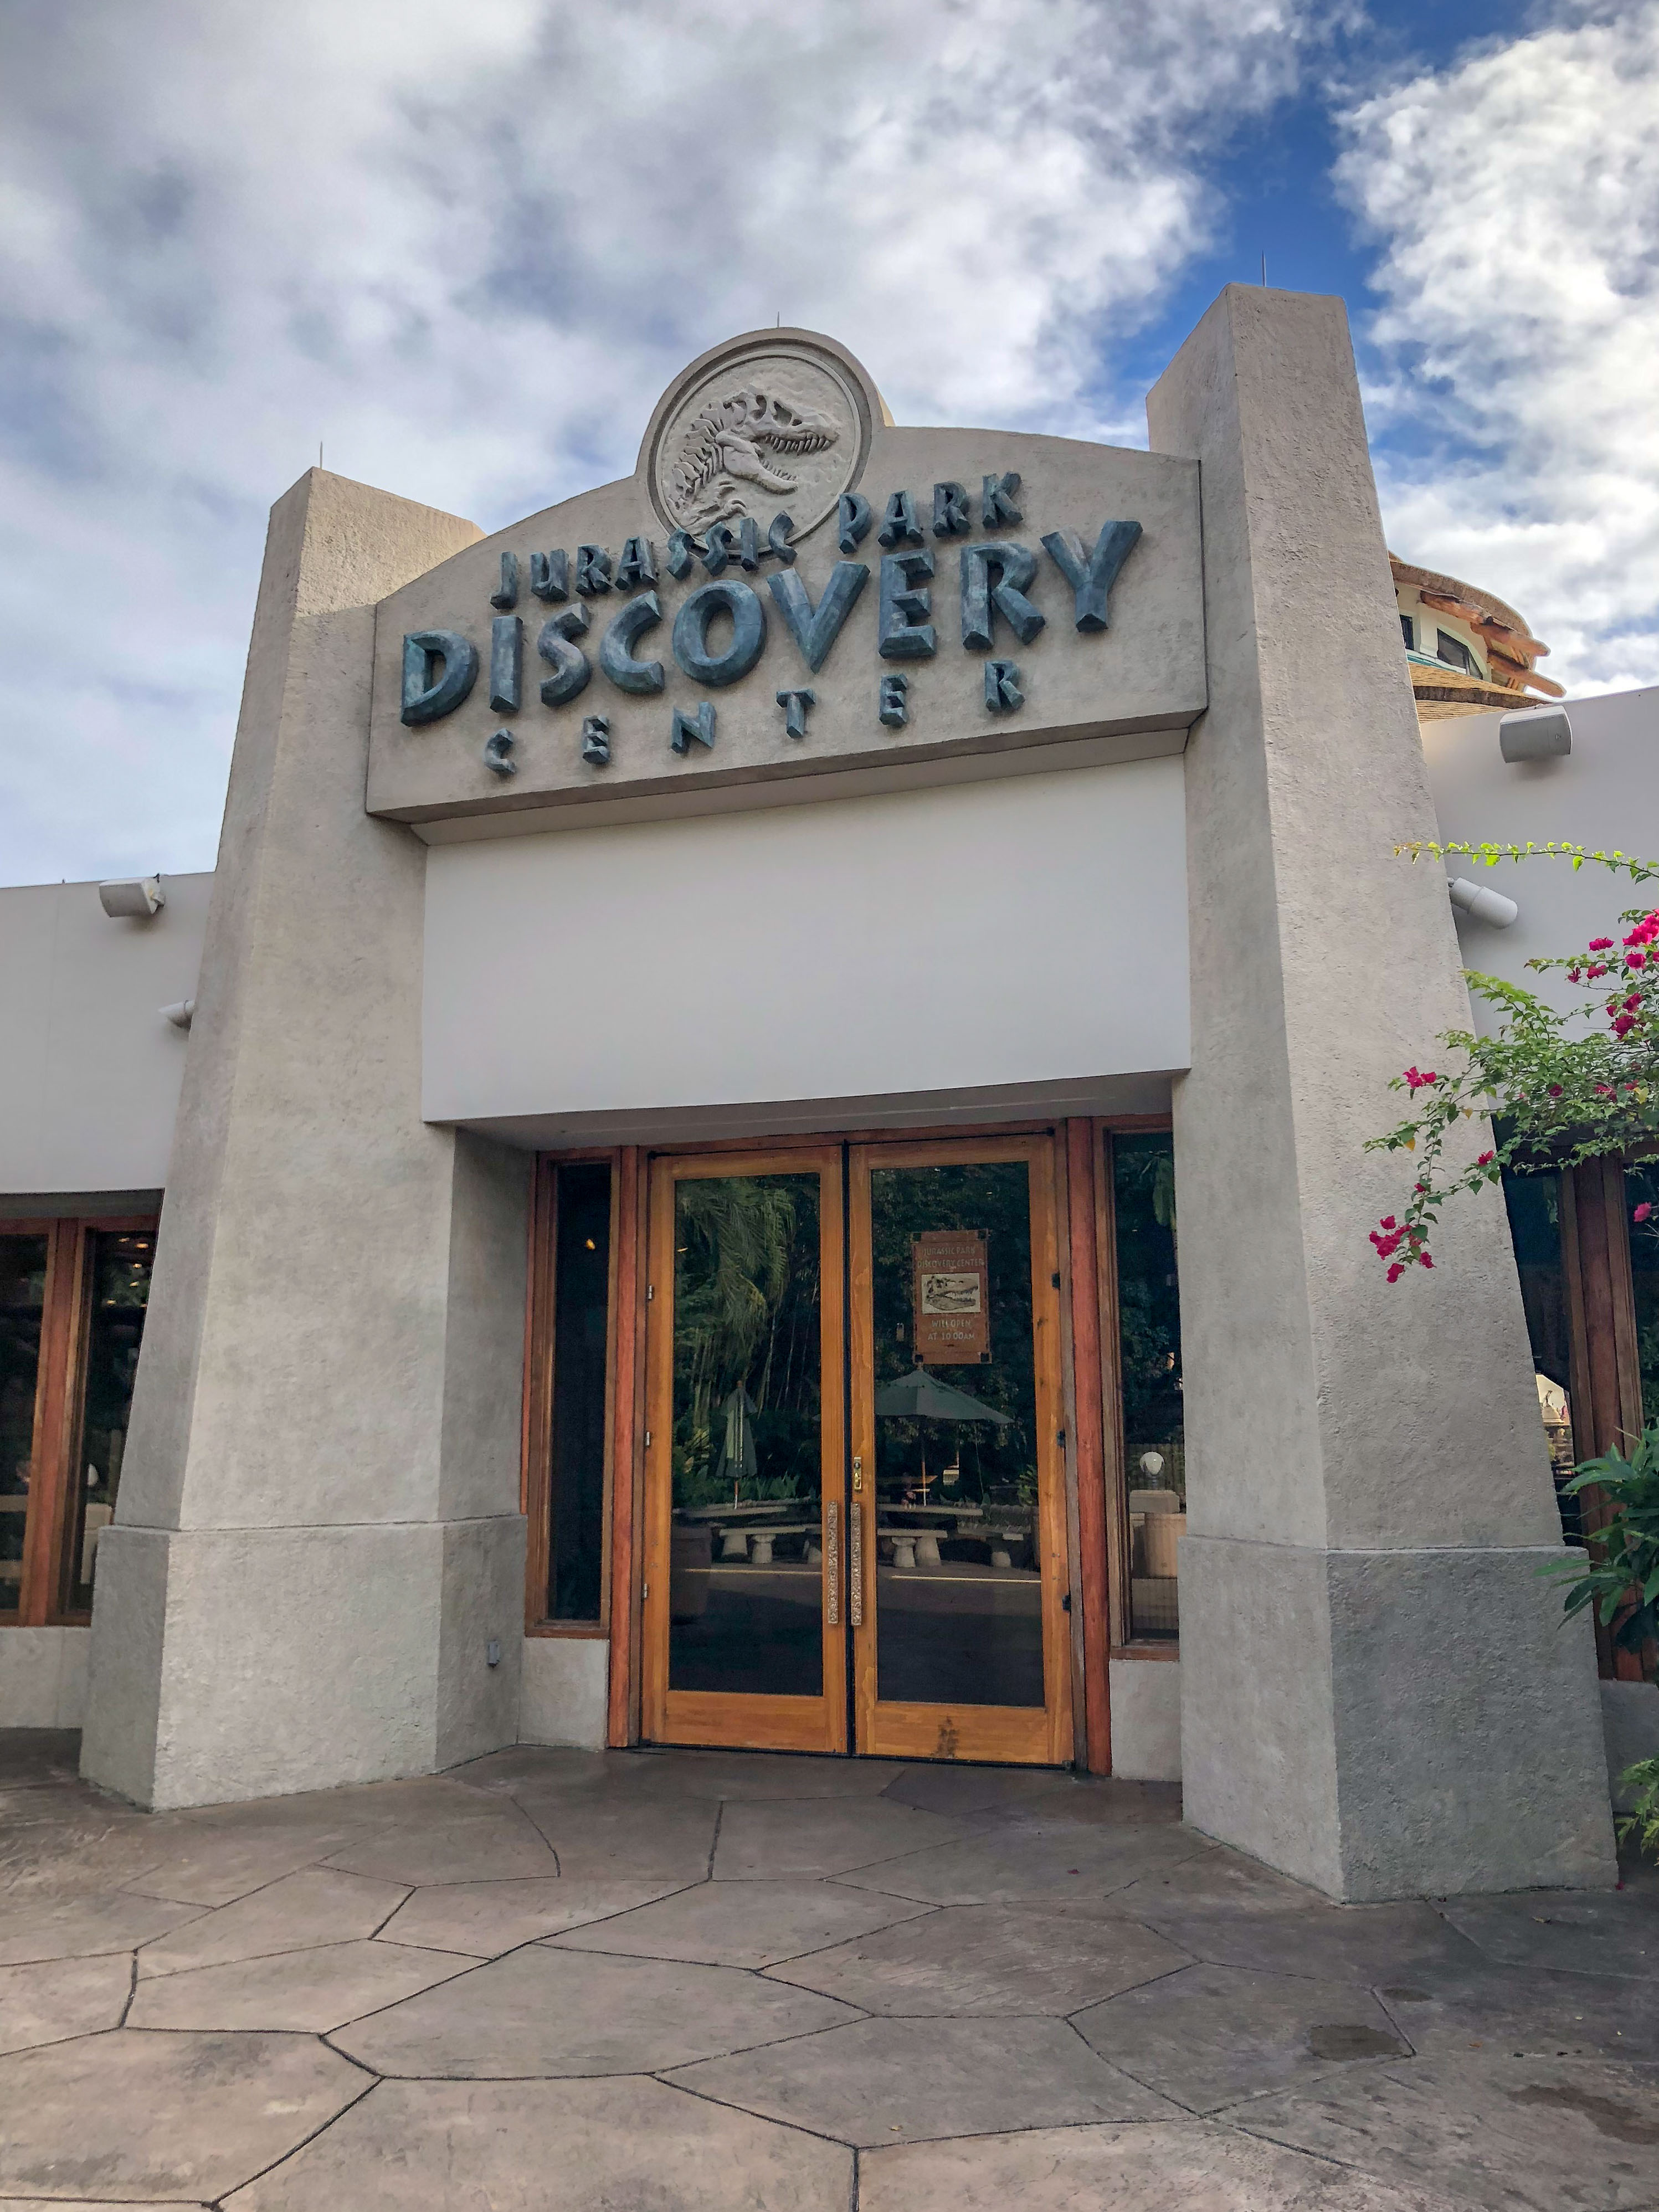 Jurassic Park Discovery Center Universal Islands Adventure Orlando